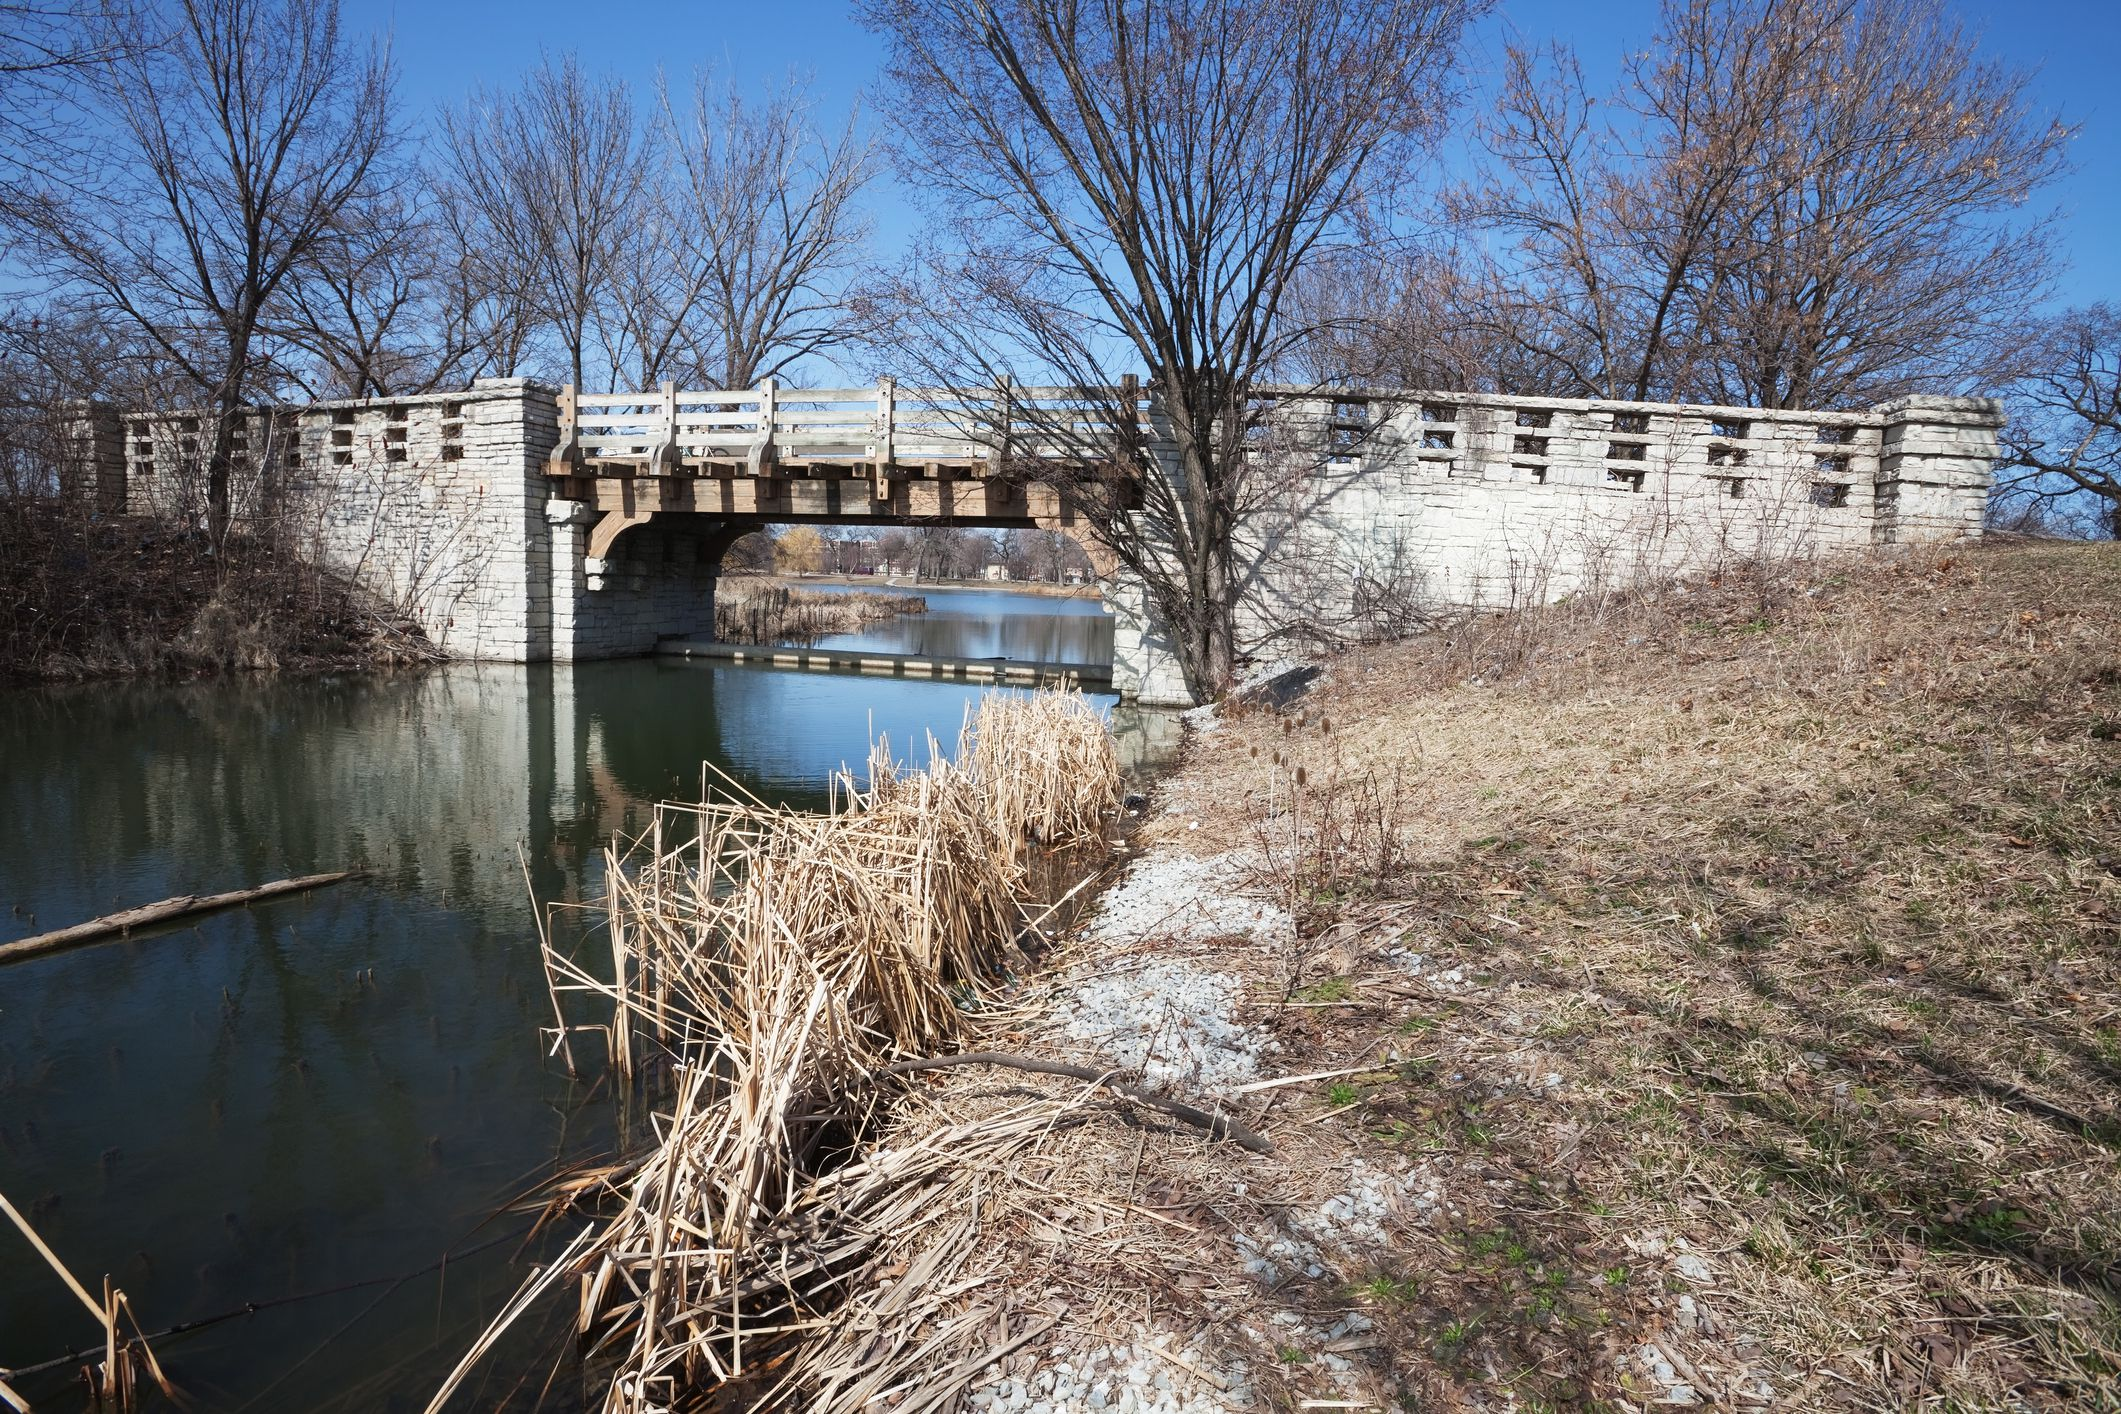 Bridge over a small lake in winter in Chicago